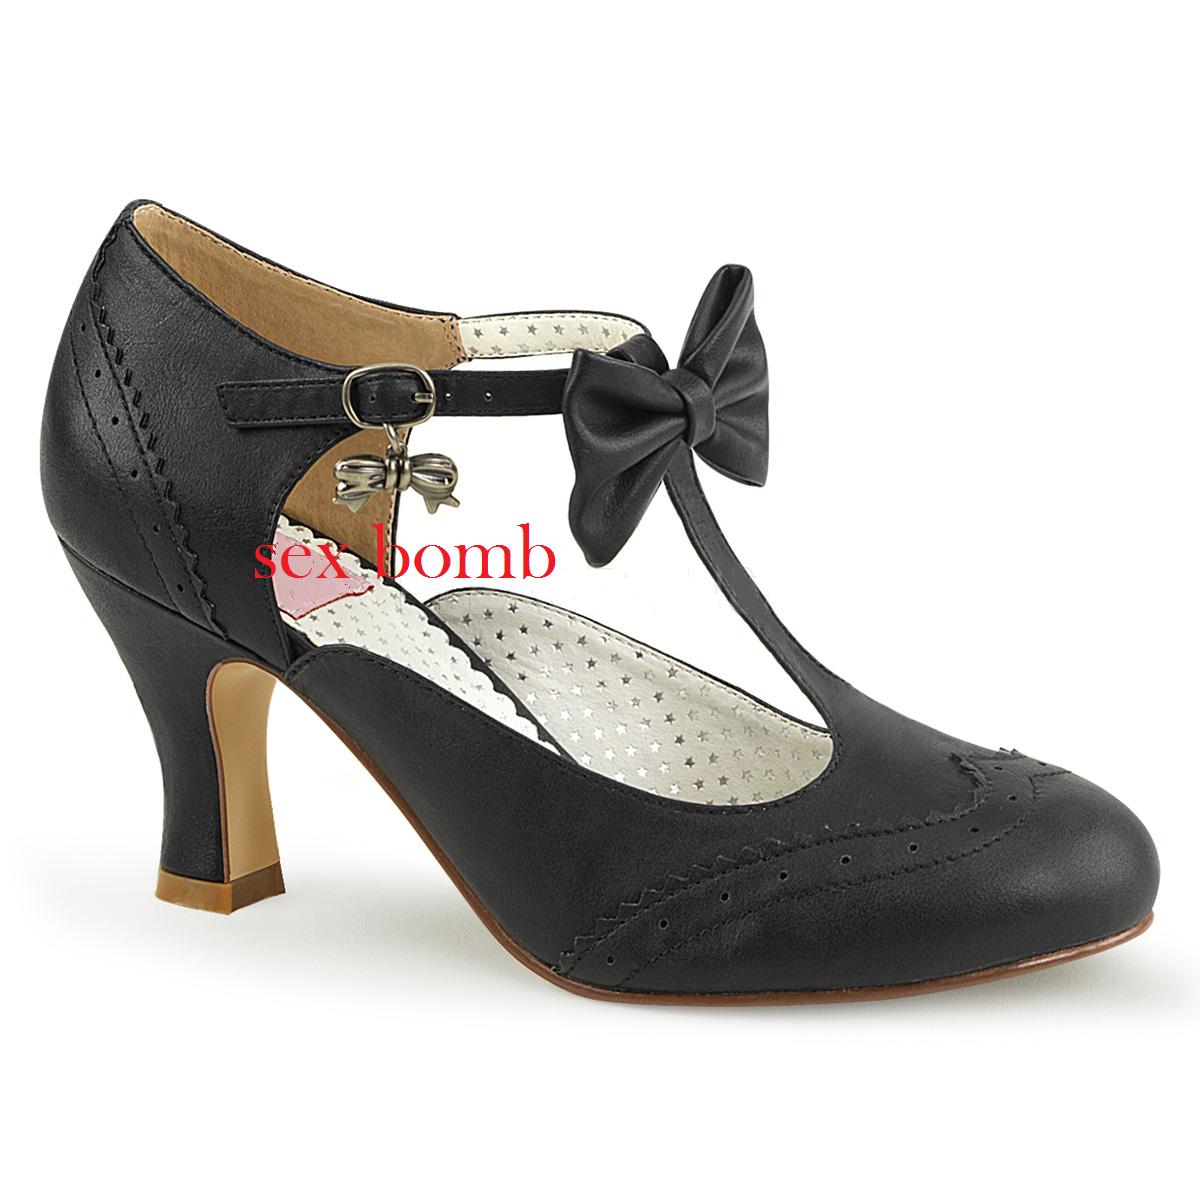 Sexy shoes PIN UP tacco 7,5 dal 36 al 42 black OPACO cinturino decolté GLAMOUR